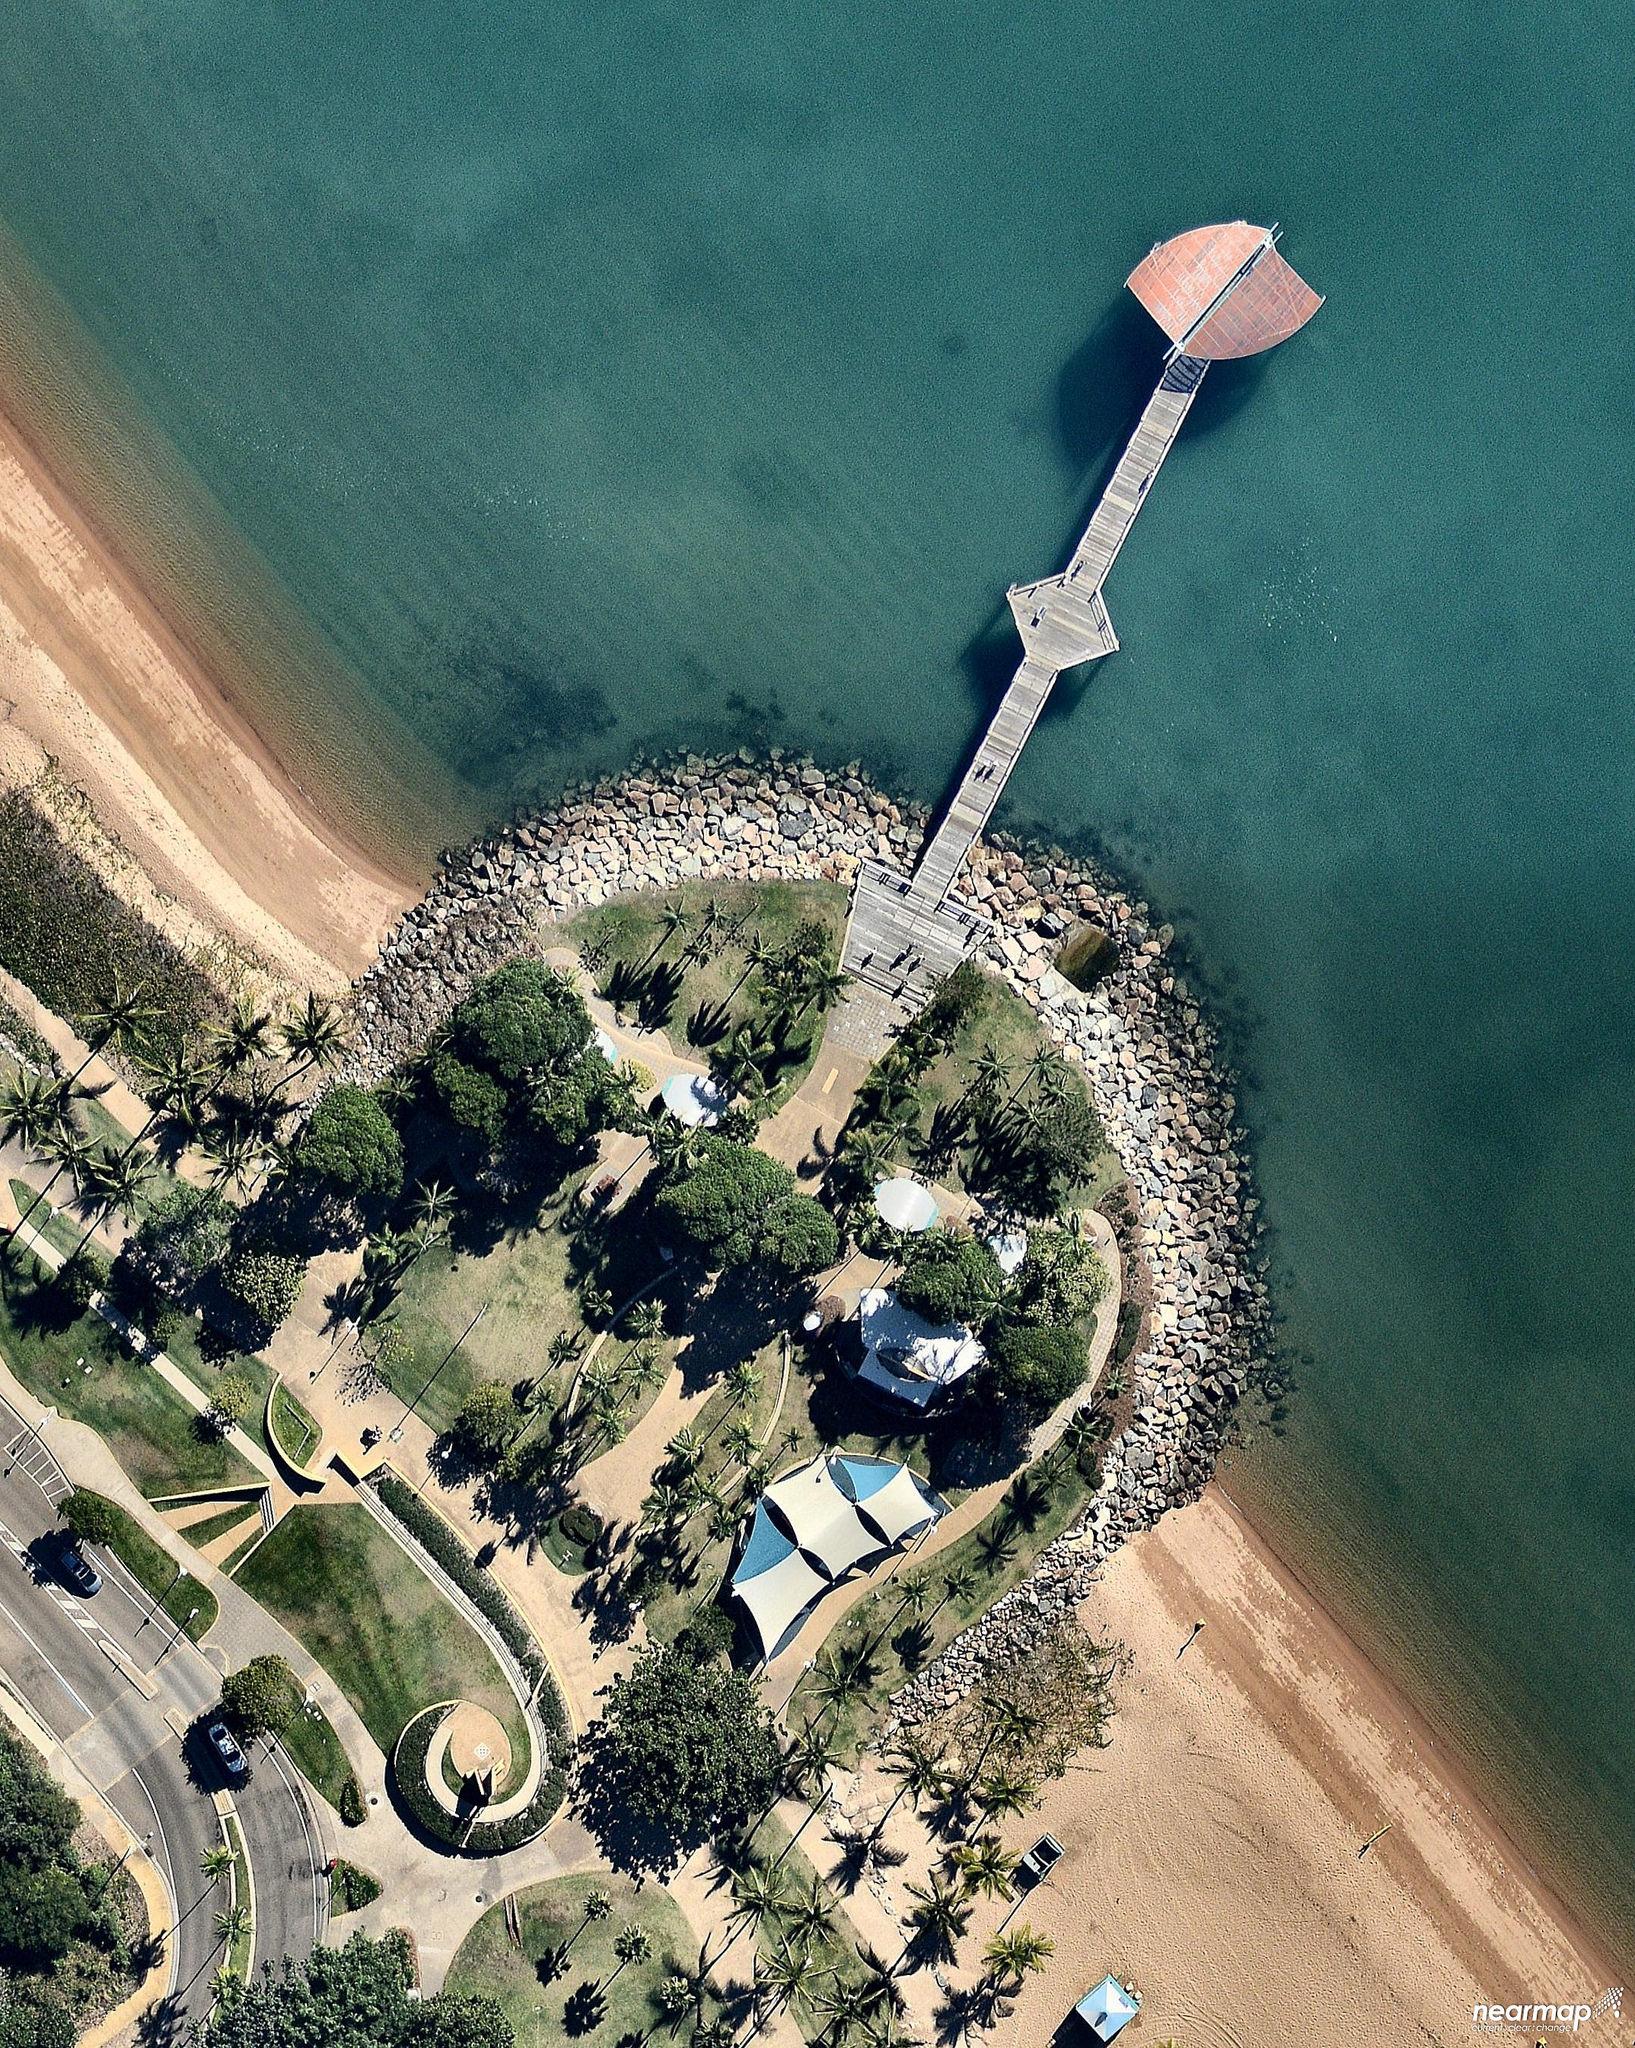 Strand Pier, Townsville, QLD